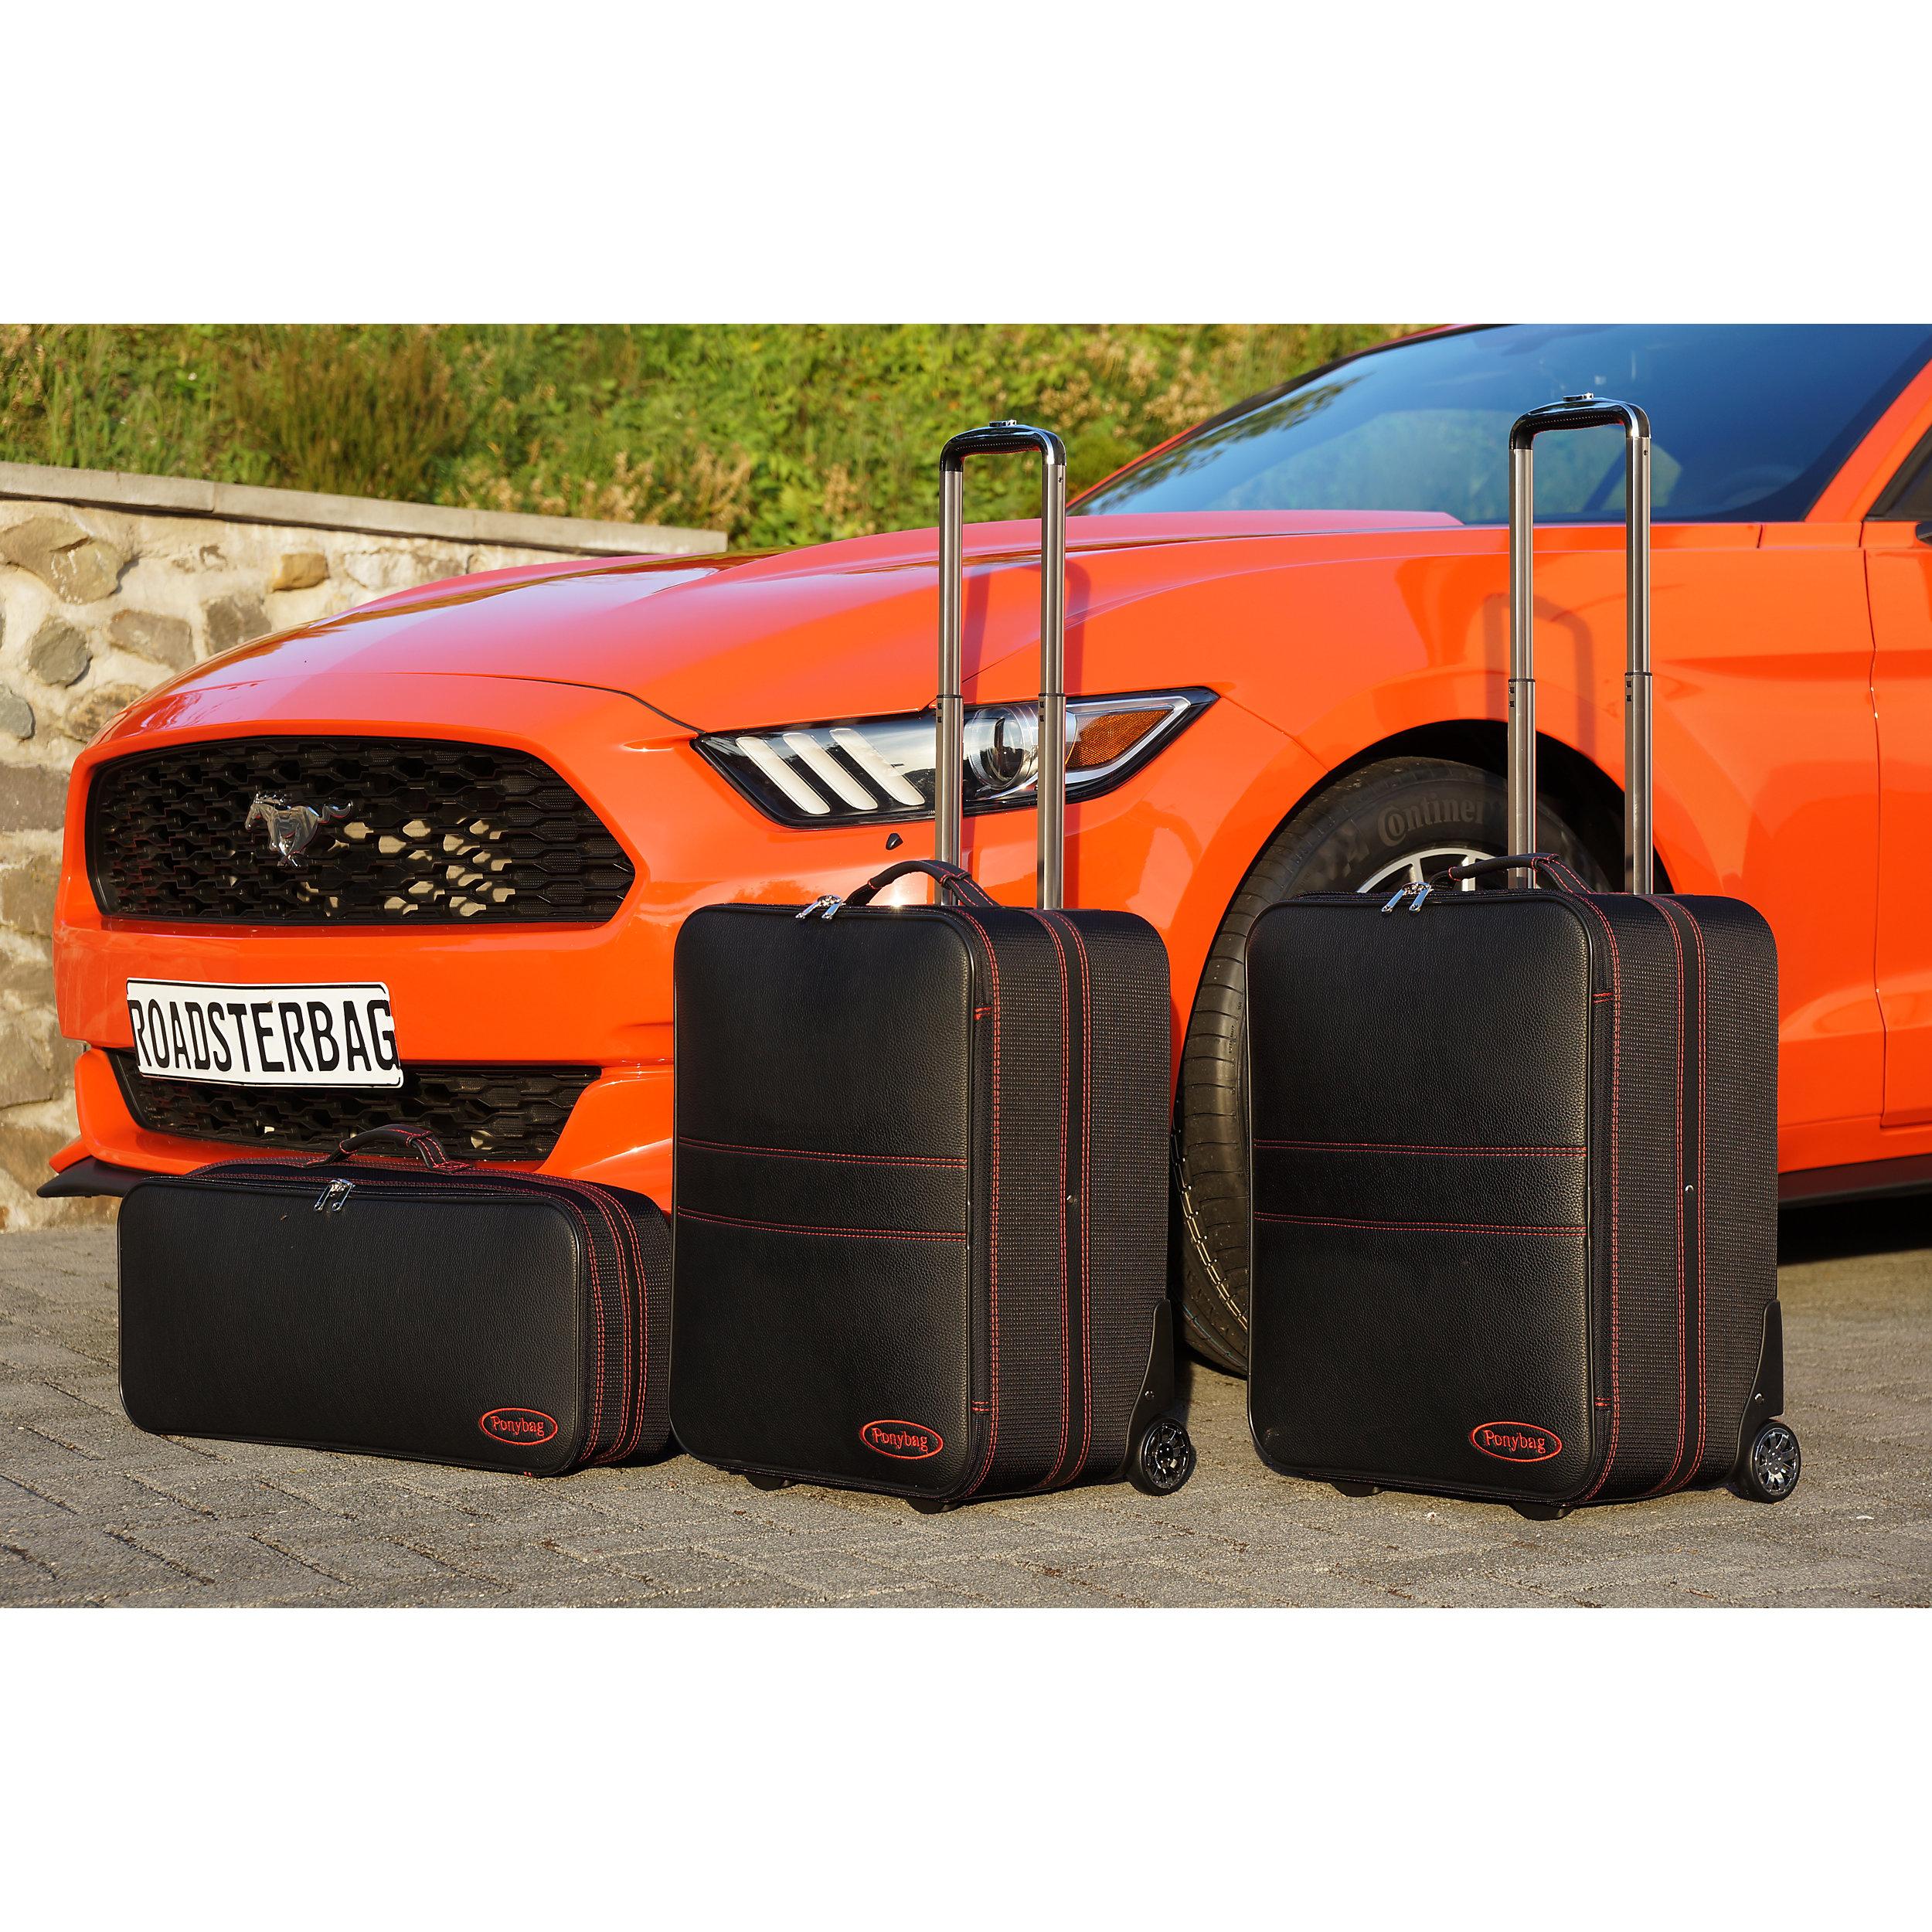 3-tlg. Kofferset mit 2 Rollen Ford Mustang Cabrio 2015 Ponybag